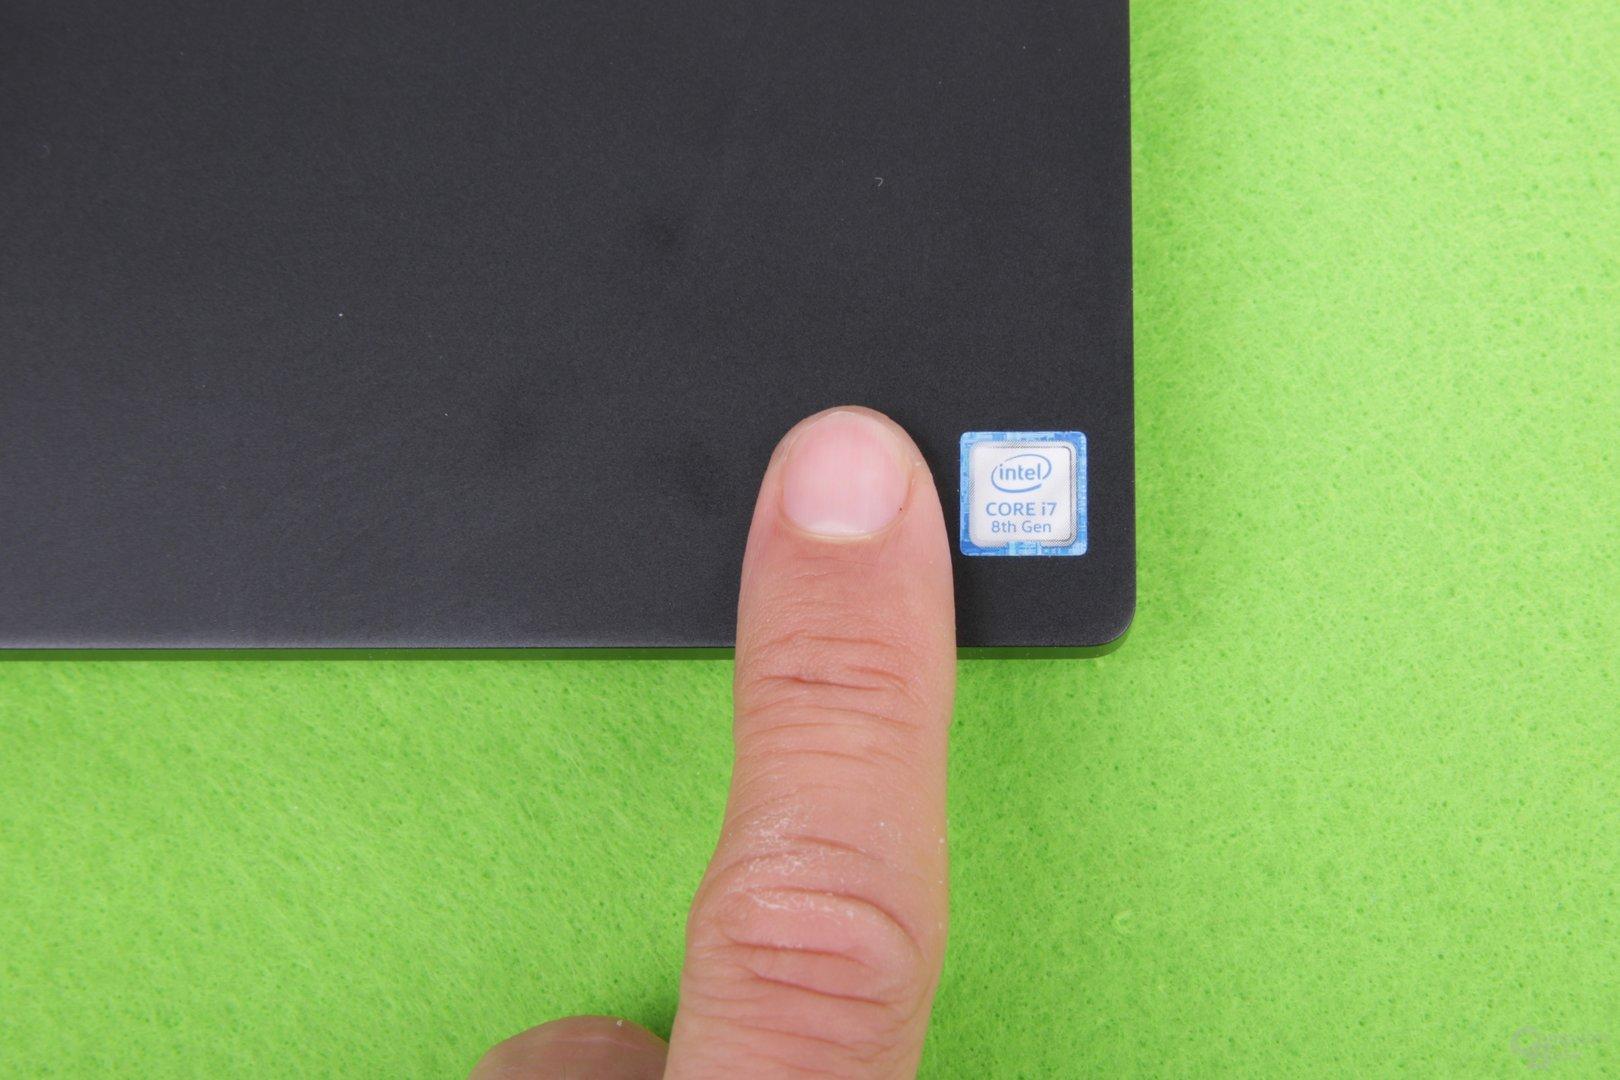 Intel-Logo ja, aber bitte nur in winzig